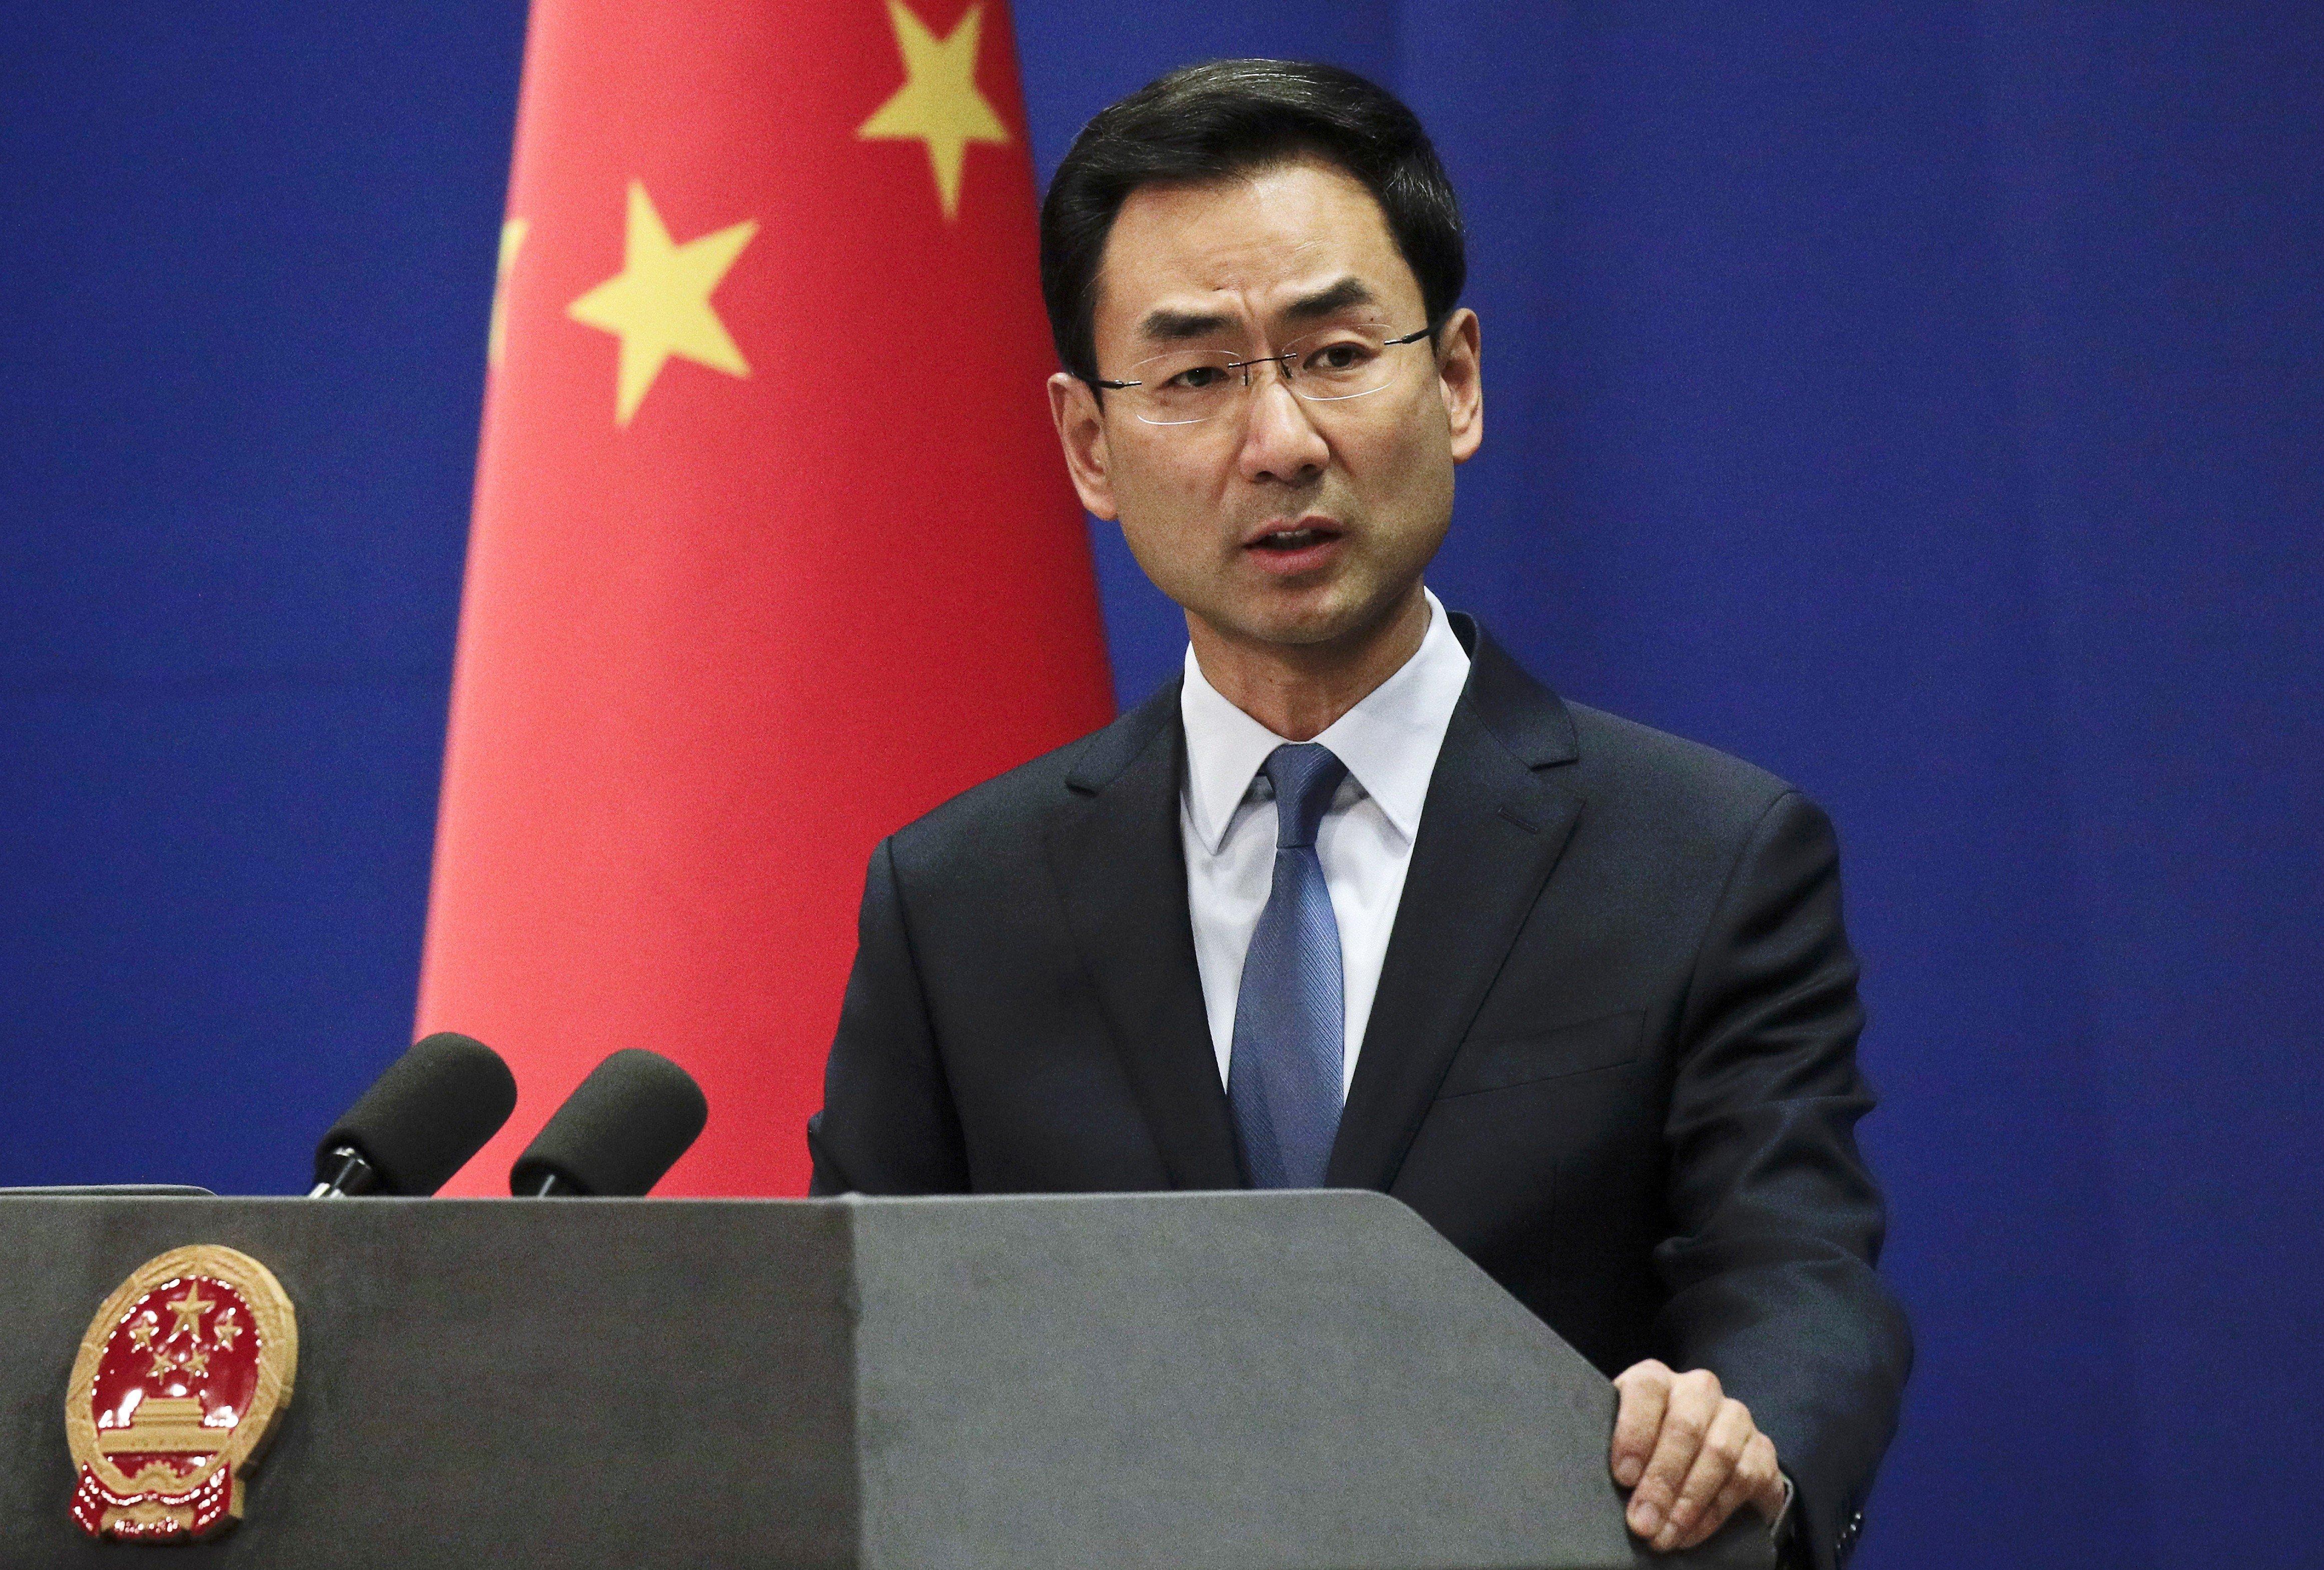 Hong Kong extradition bill complicates an already tense US